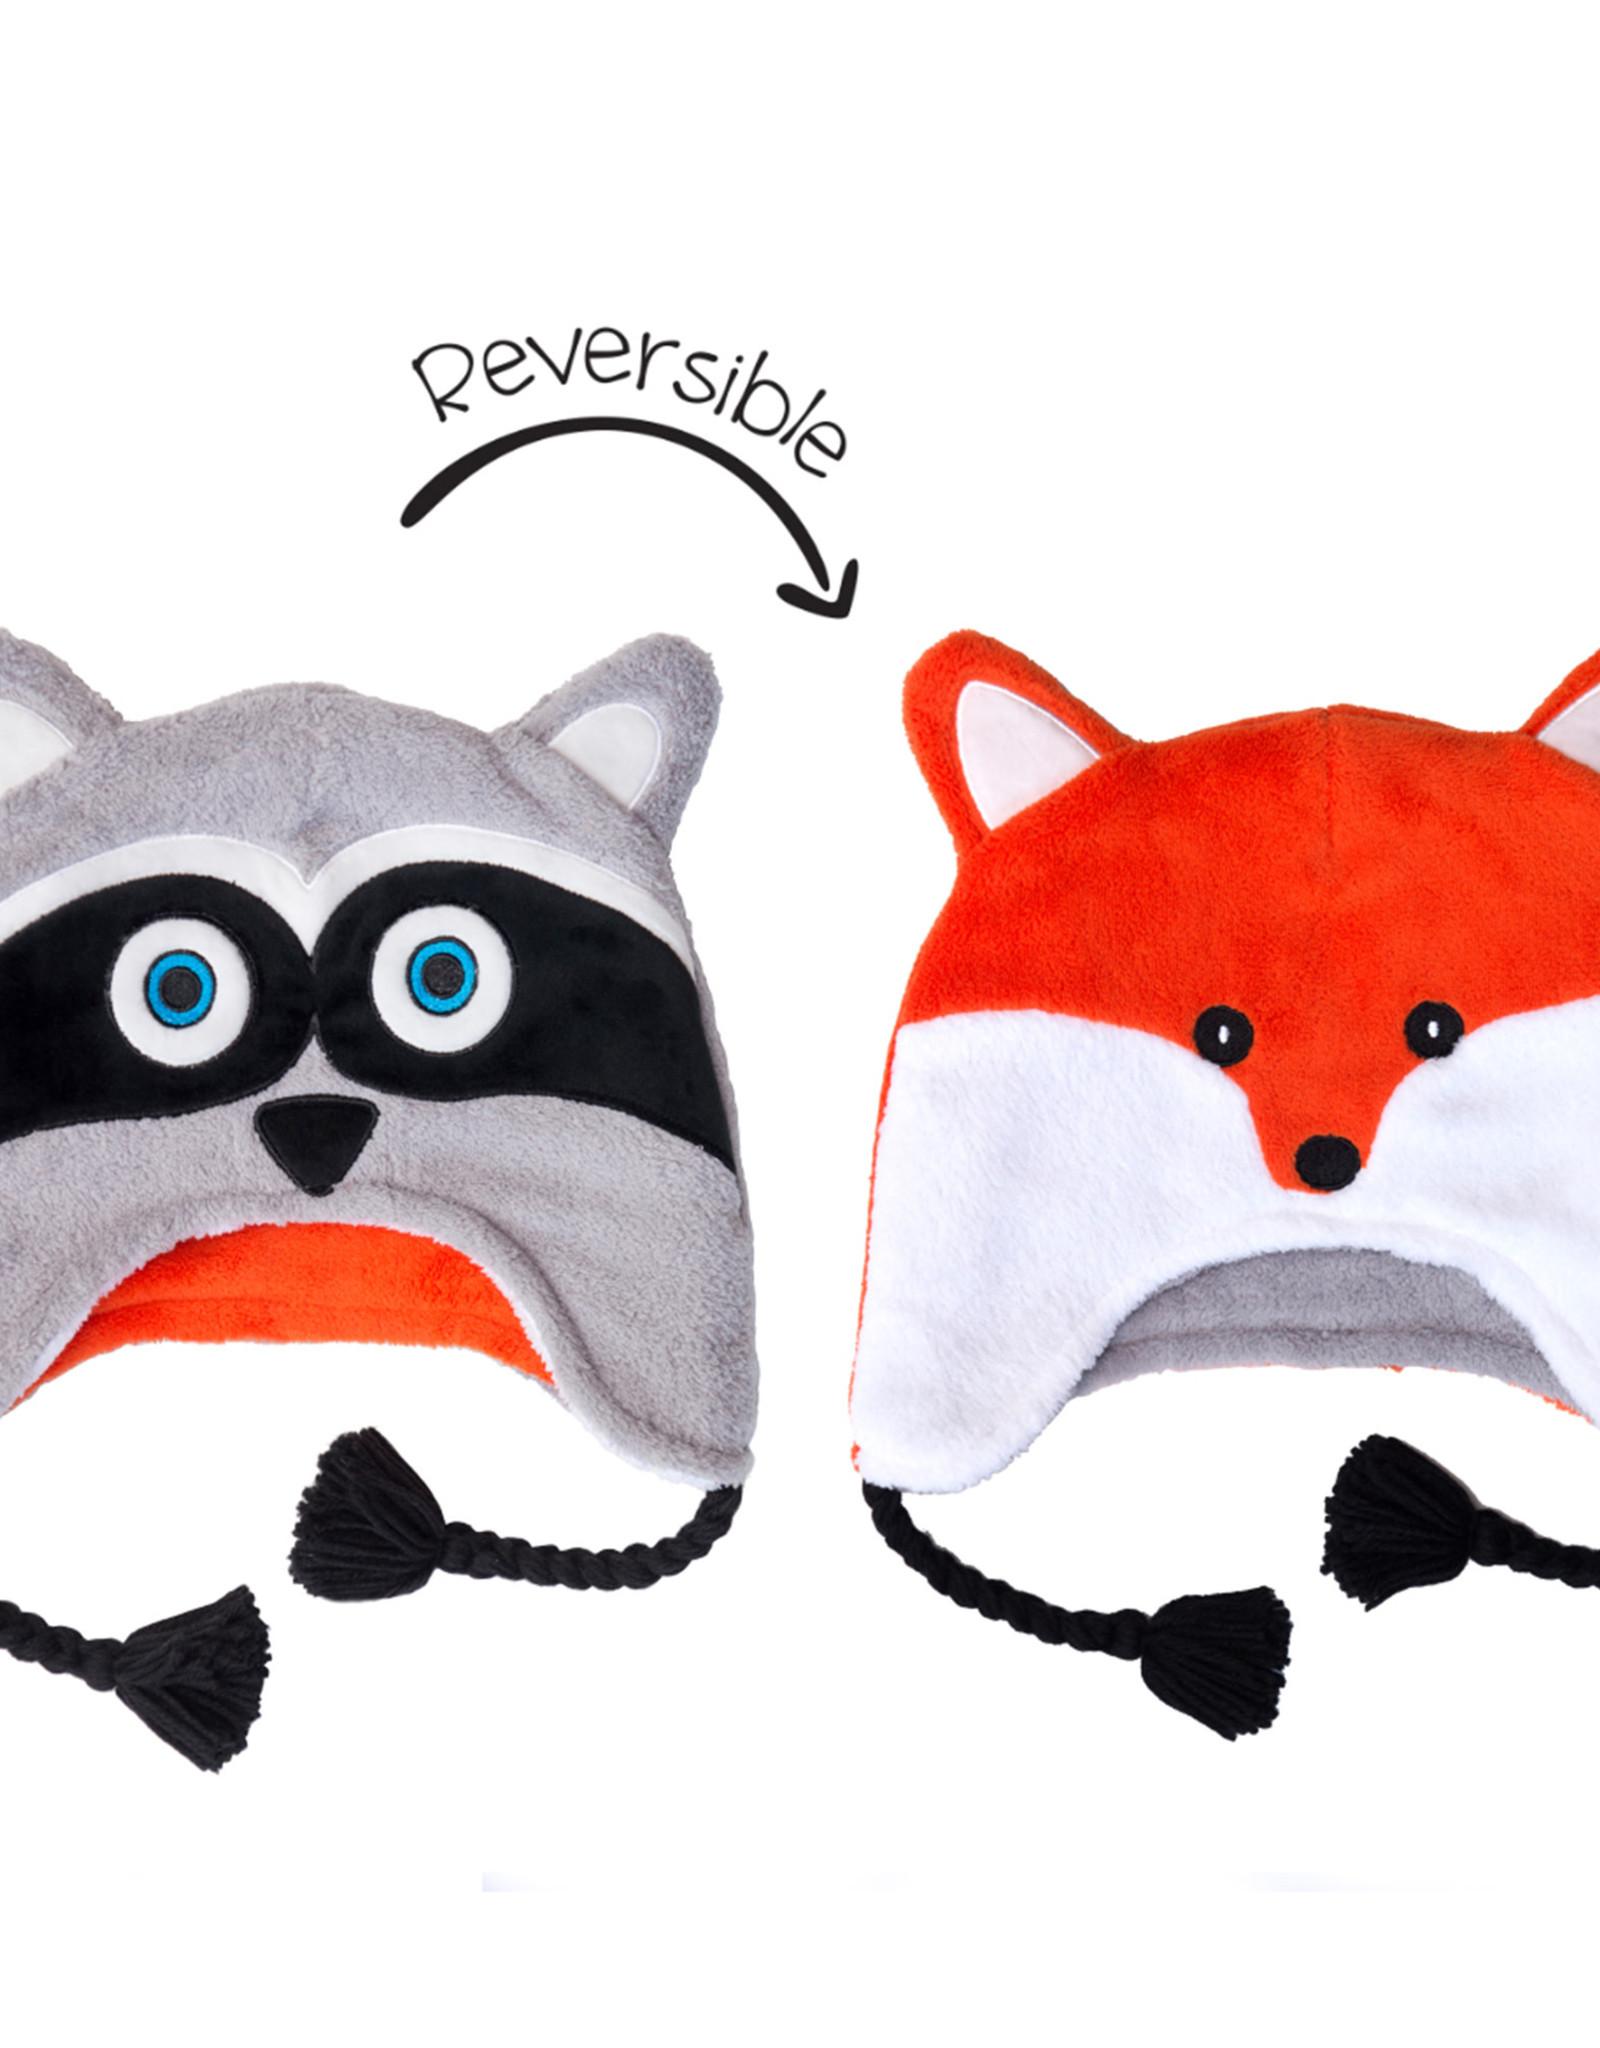 FlapJackKids FlapJackKids Reversible Fleece Hat - Raccoon/Fox - Baby/Toddler